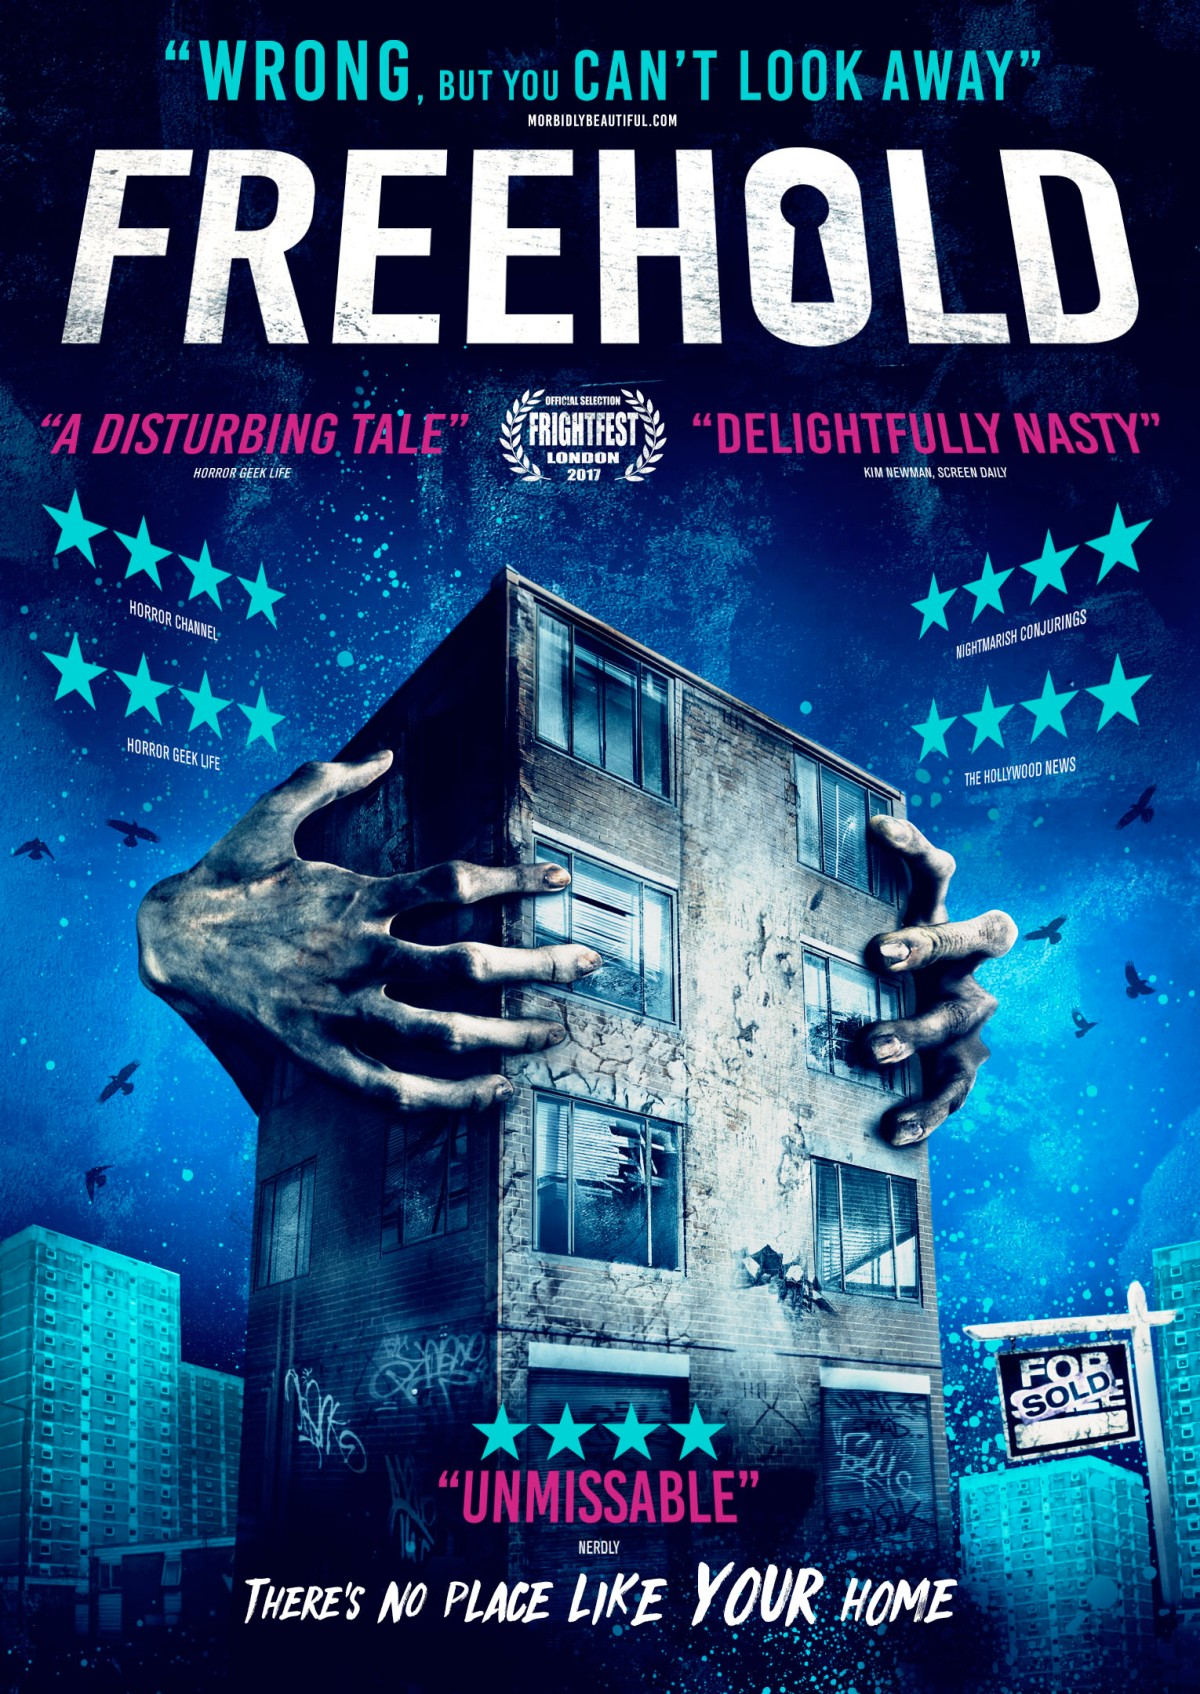 Freehold (2017, dir. DominicBridges)